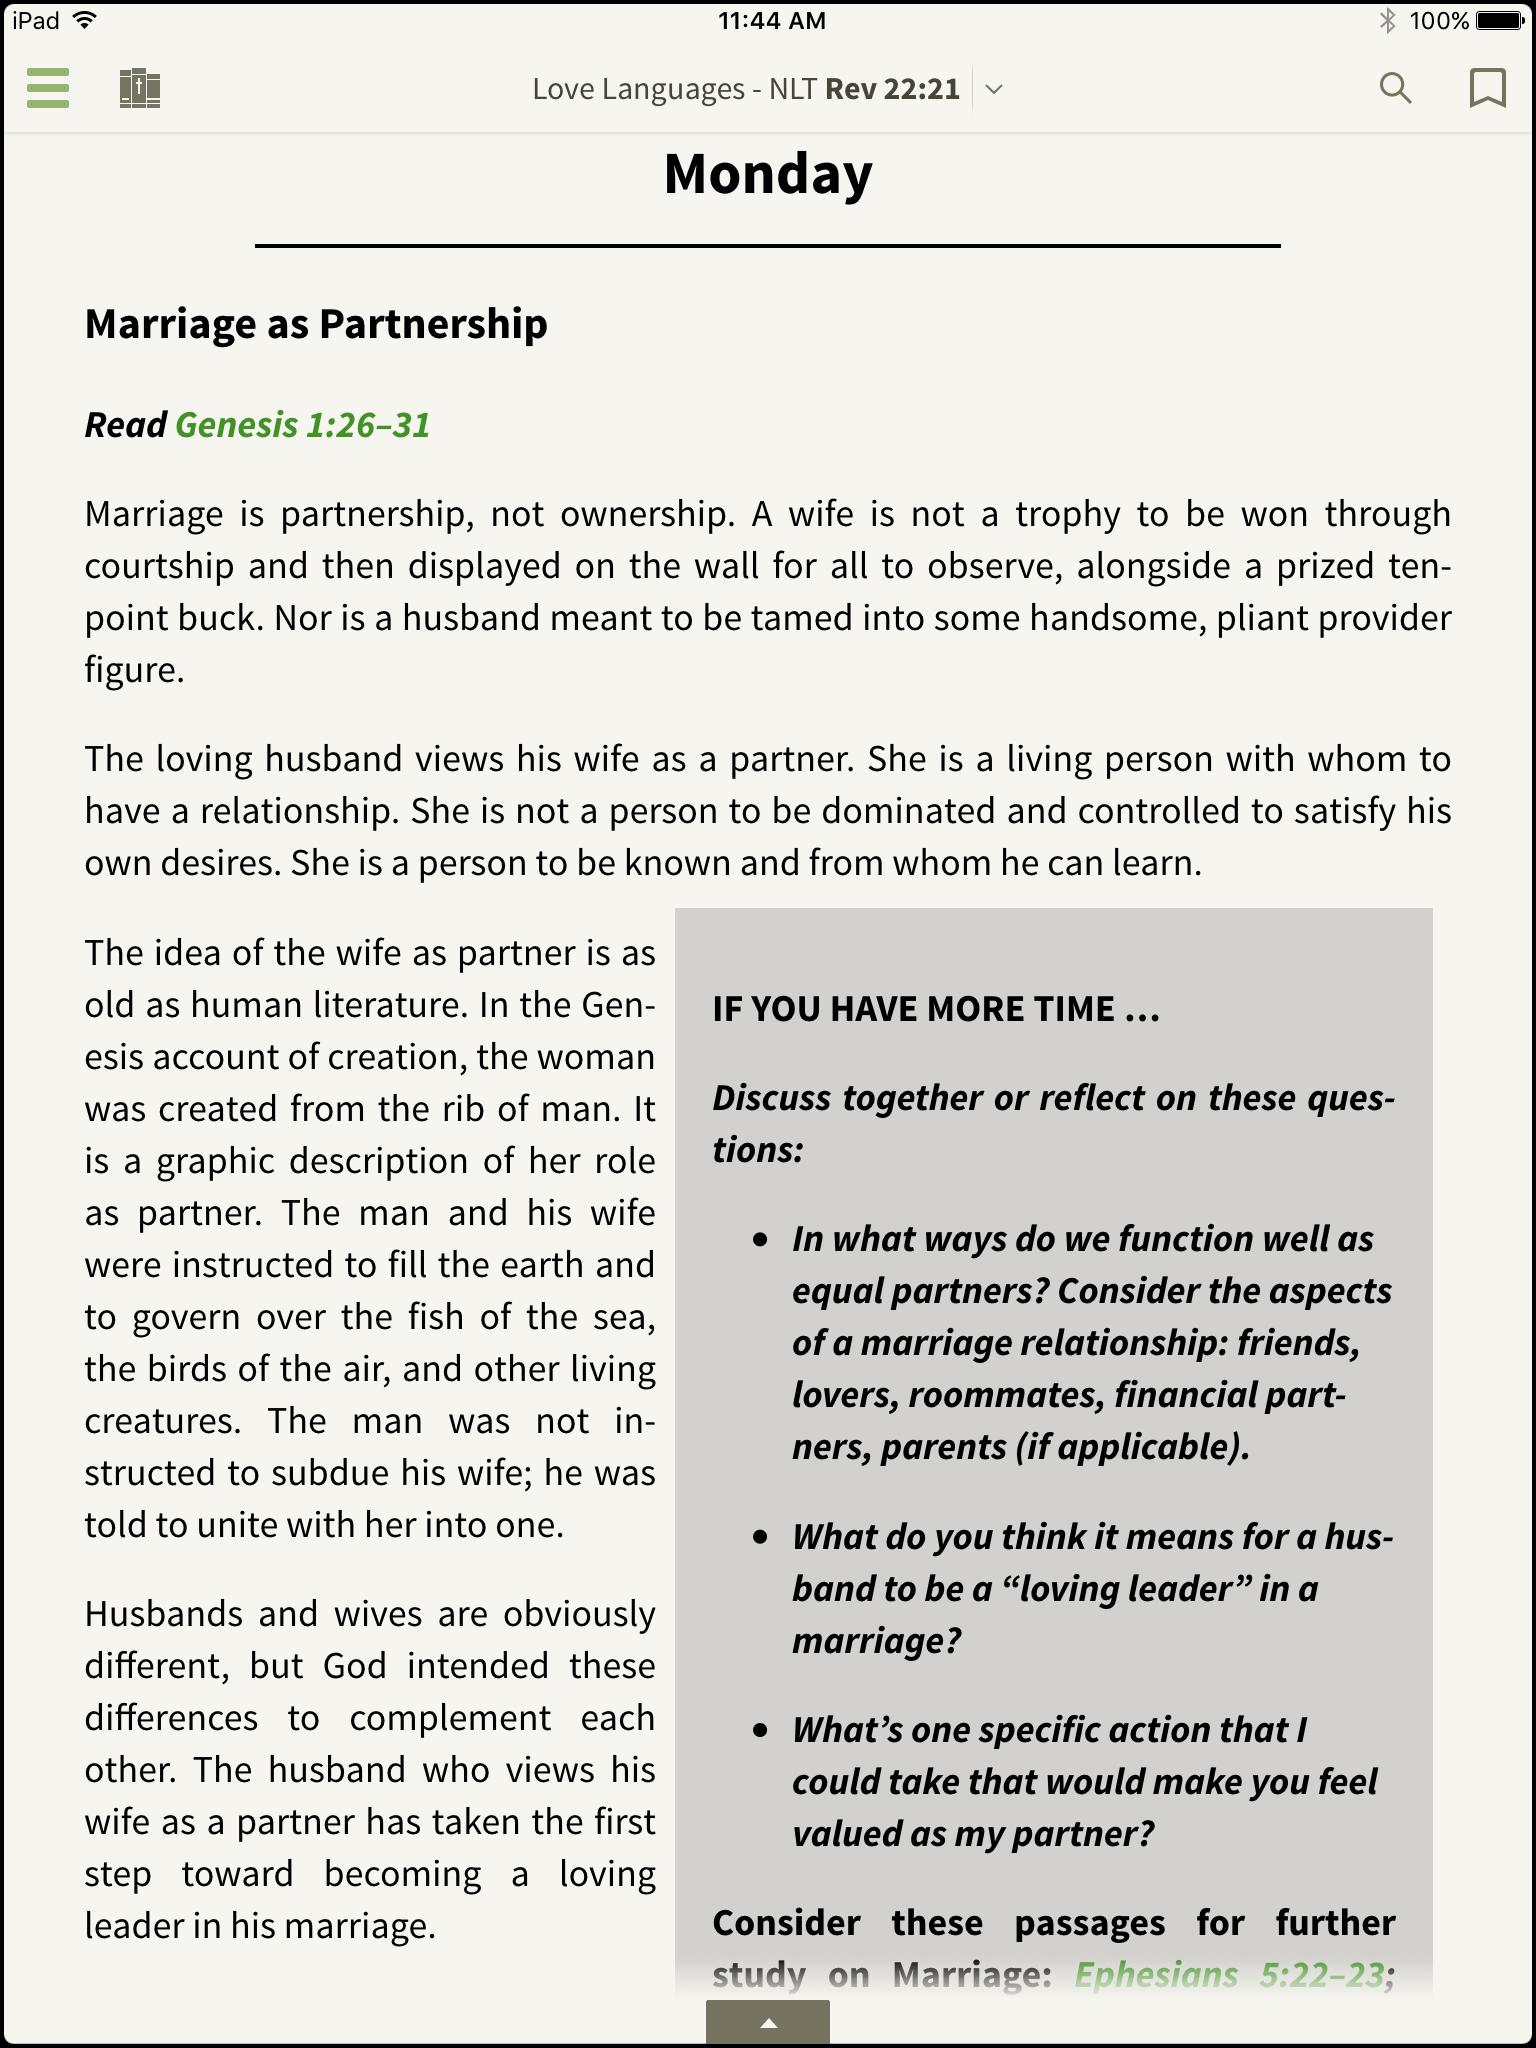 look inside love languages devotional bible olive tree blog